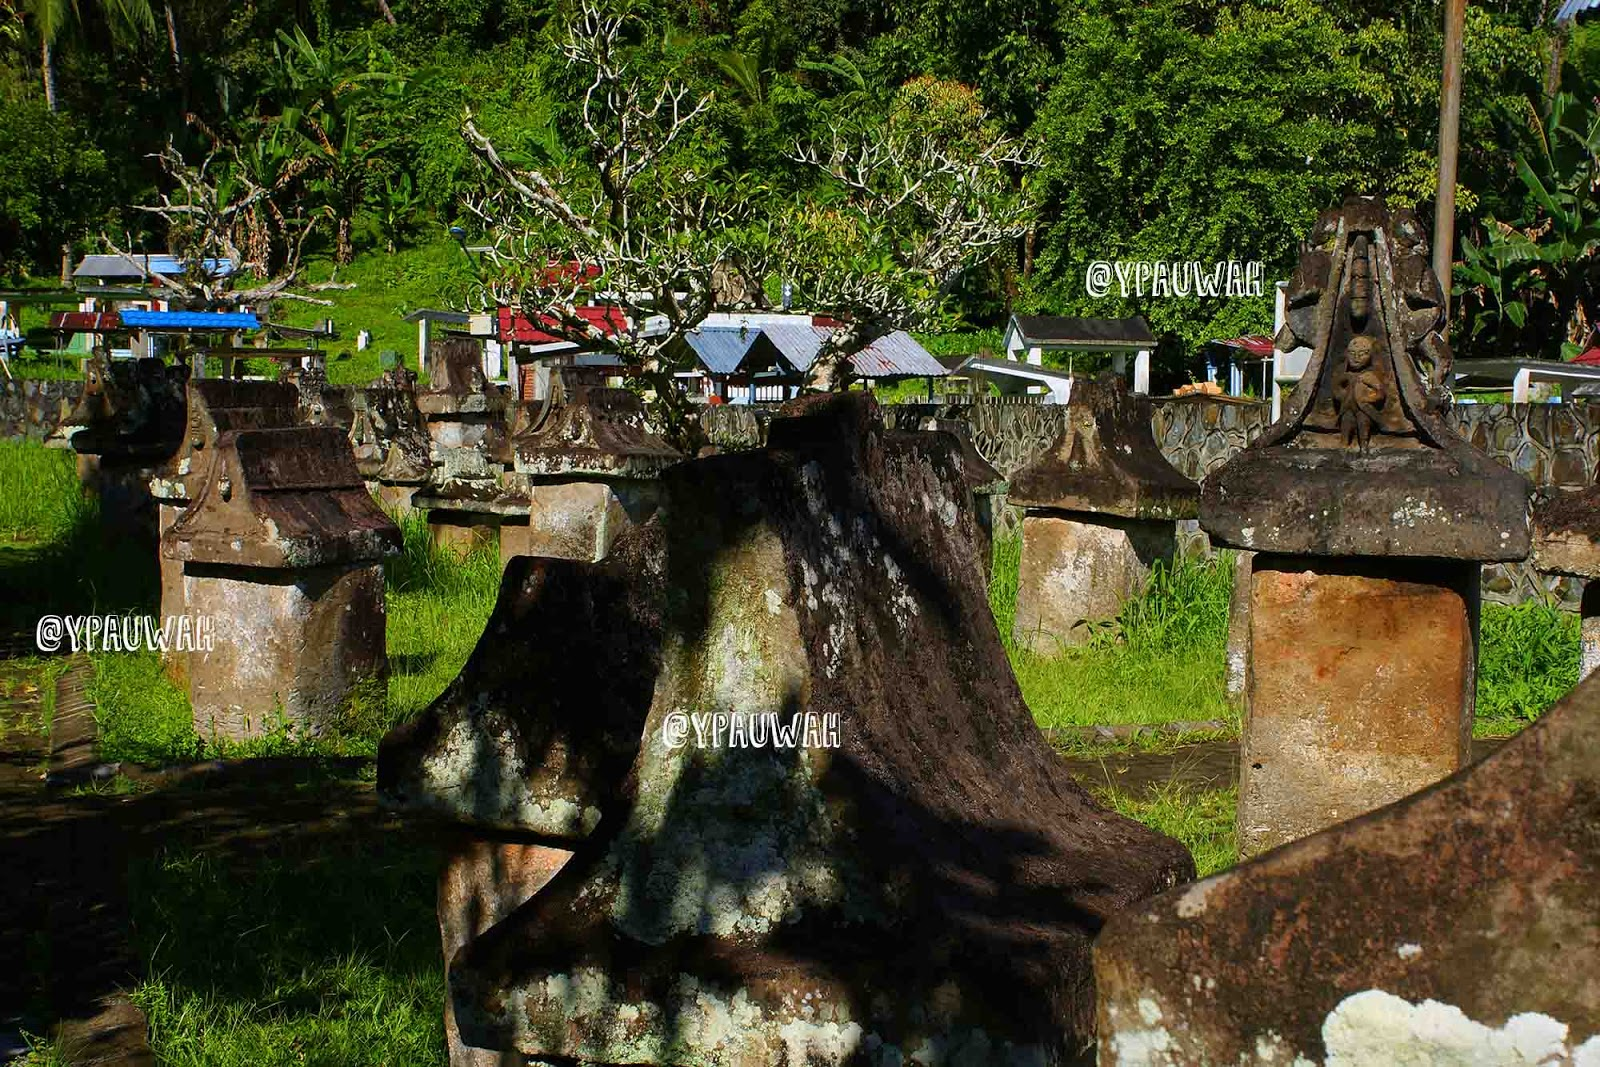 Yrp Peti Batu Kuburan Waruga Sawangan Hal Tersebut Memiliki Keyakinan